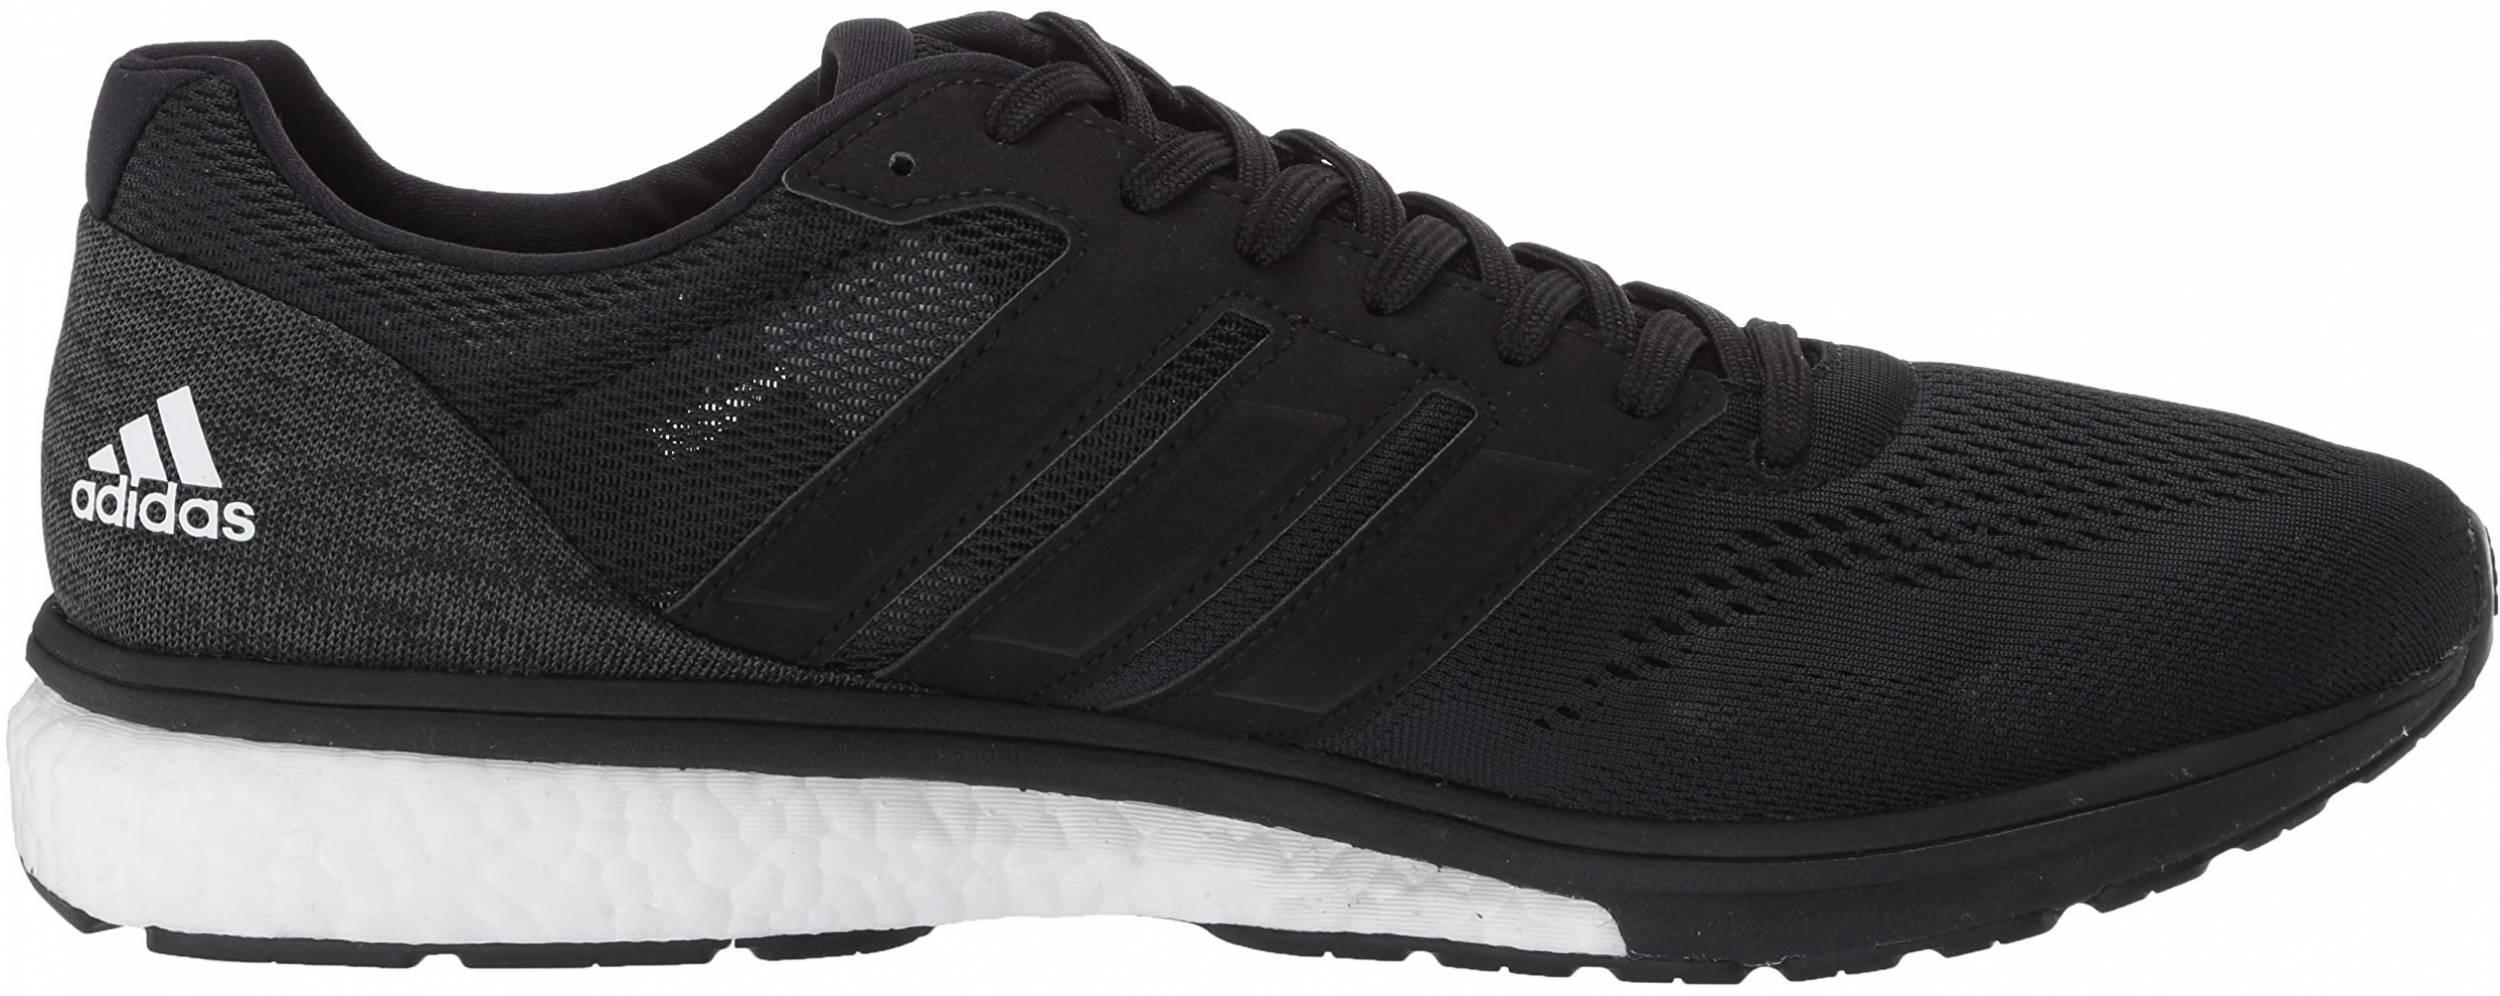 Adidas Adizero Boston Boost 7 - Deals ($110), Facts, Reviews (2021 ...